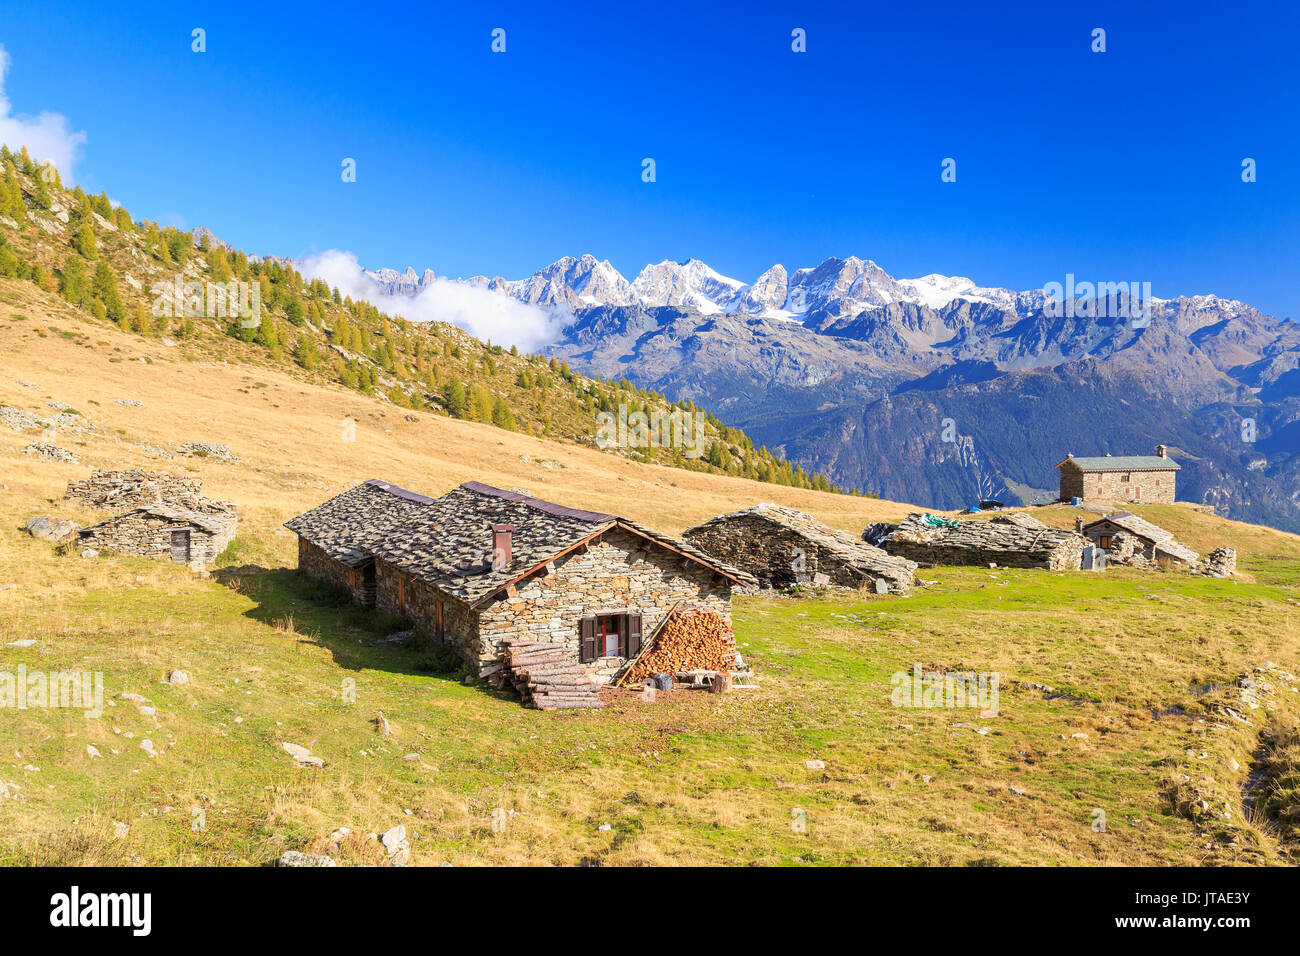 Alpine huts framed by snowy peaks of Bernina Group, Arcoglio Alp, Val Torreggio, Malenco Valley, Valtellina, Lombardy, Stock Photo